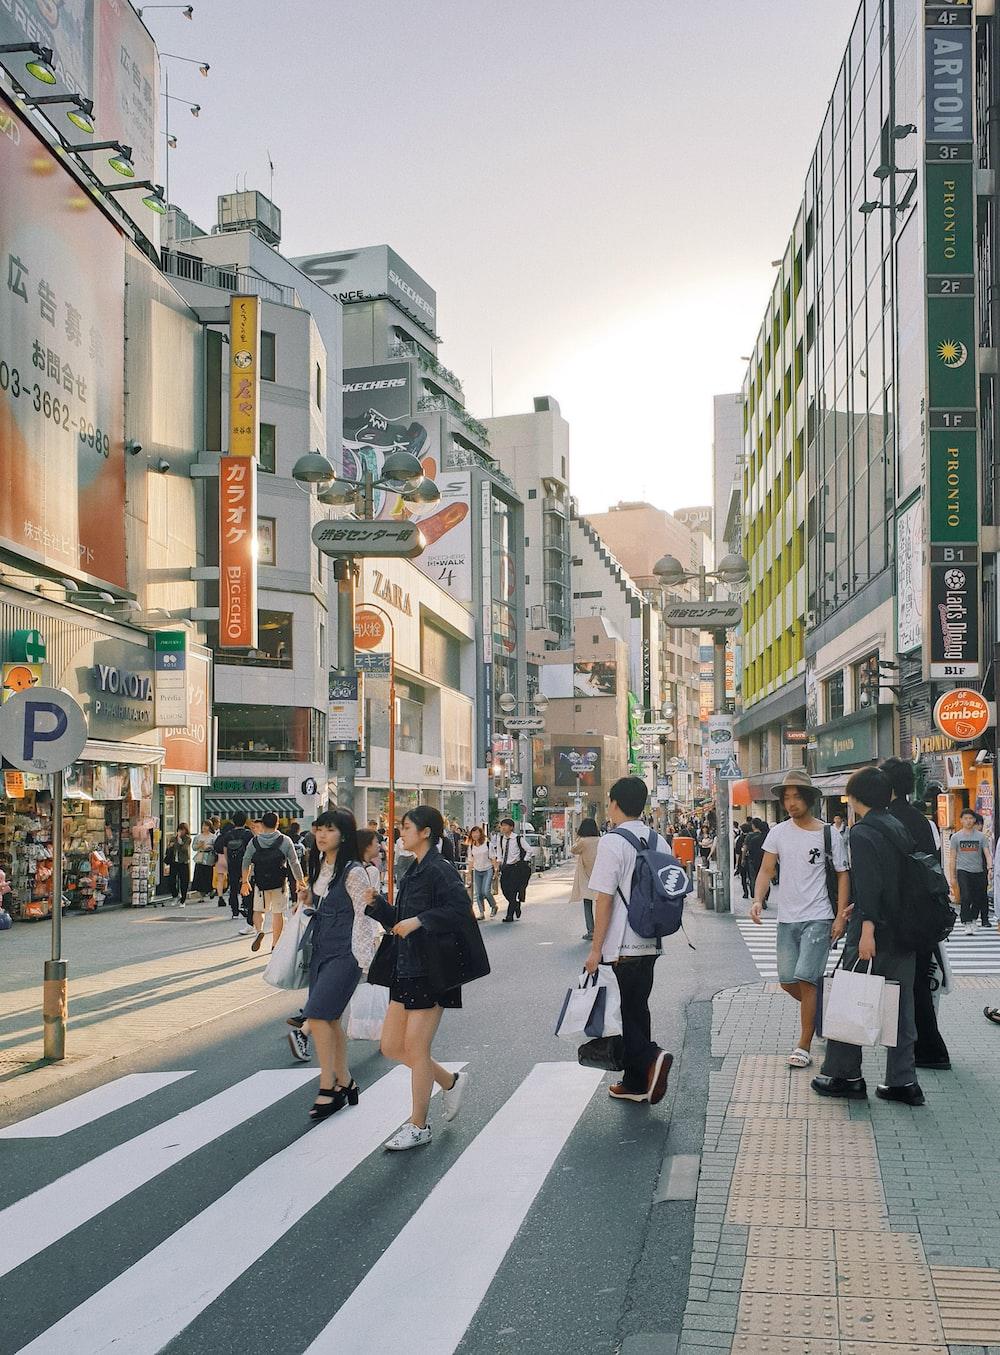 people walking on roadside during daytime